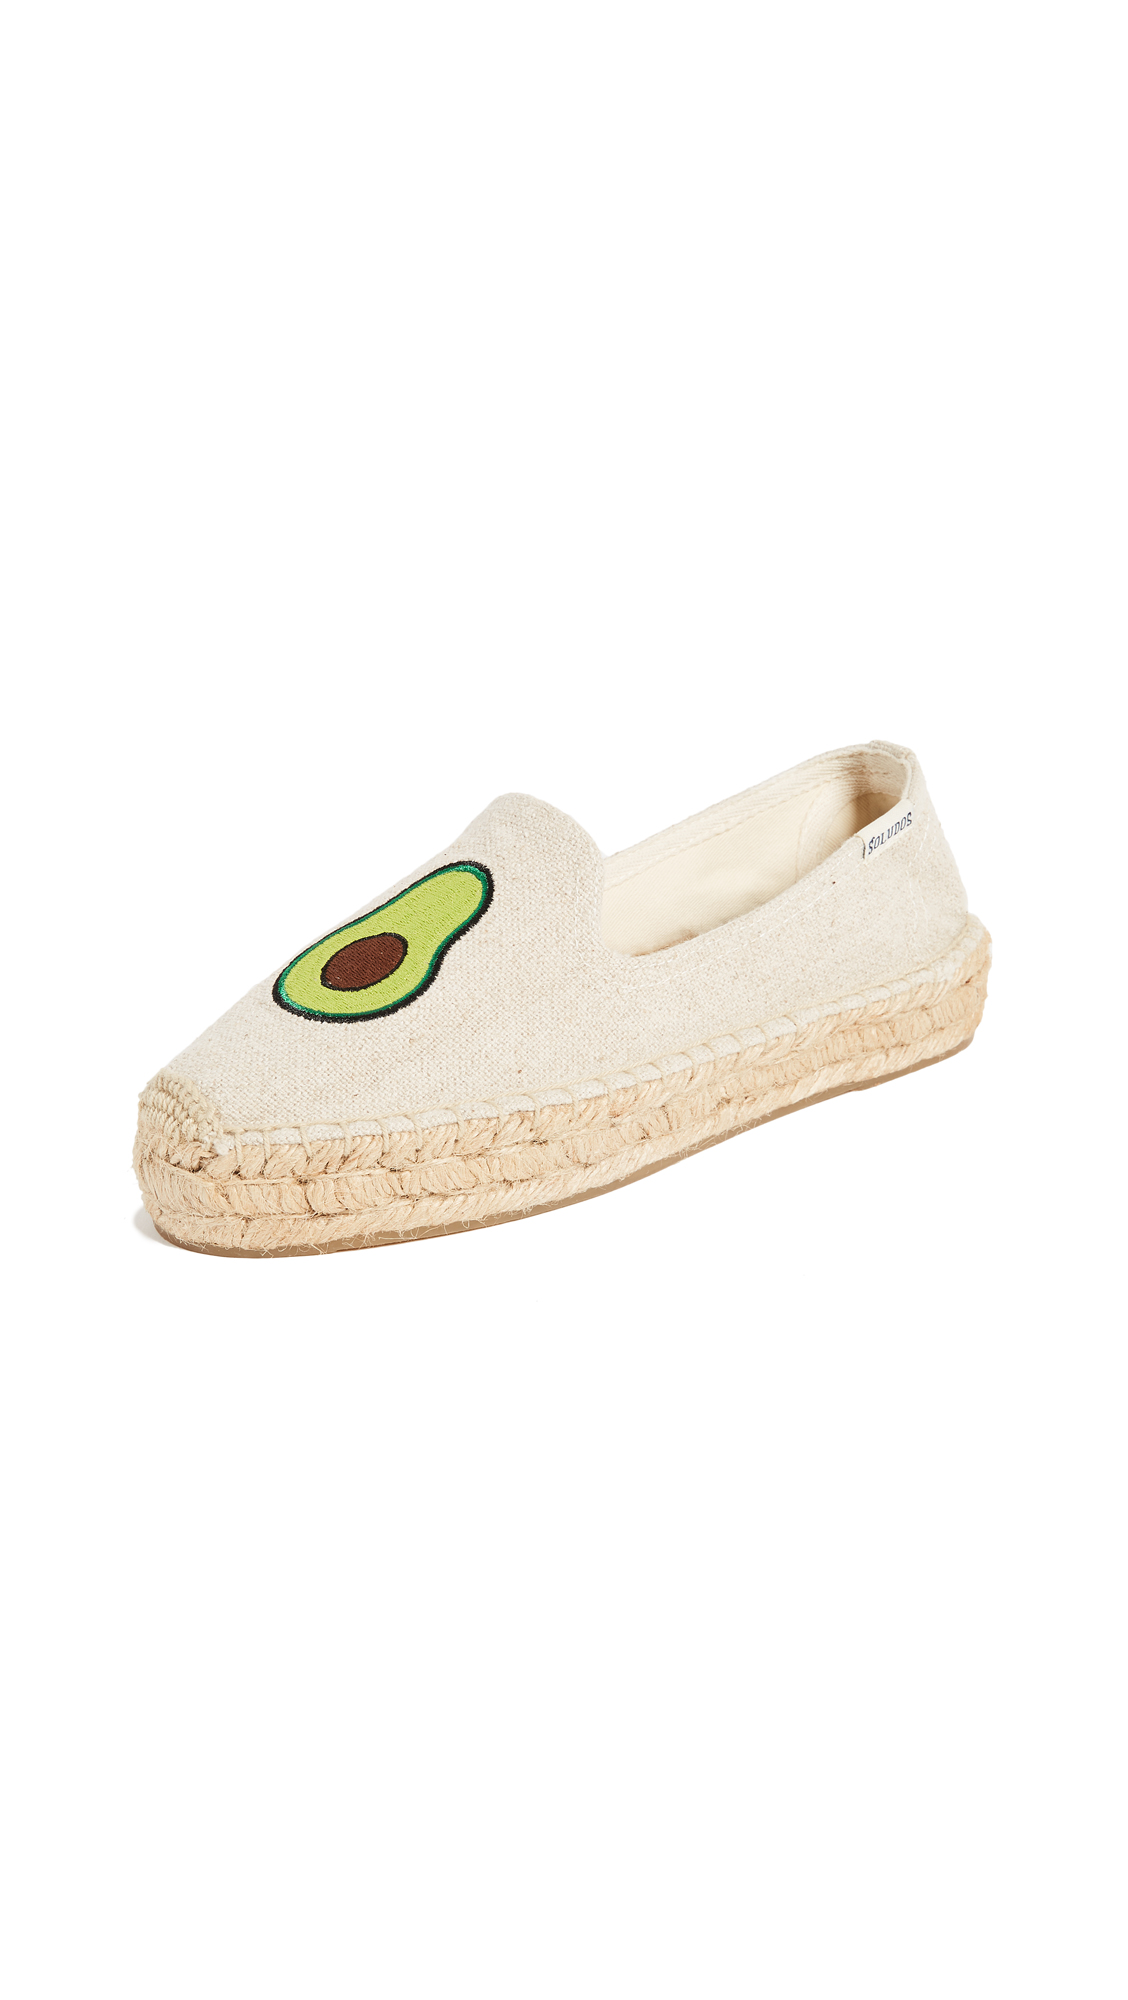 Soludos Avocado Platform Smoking Slippers